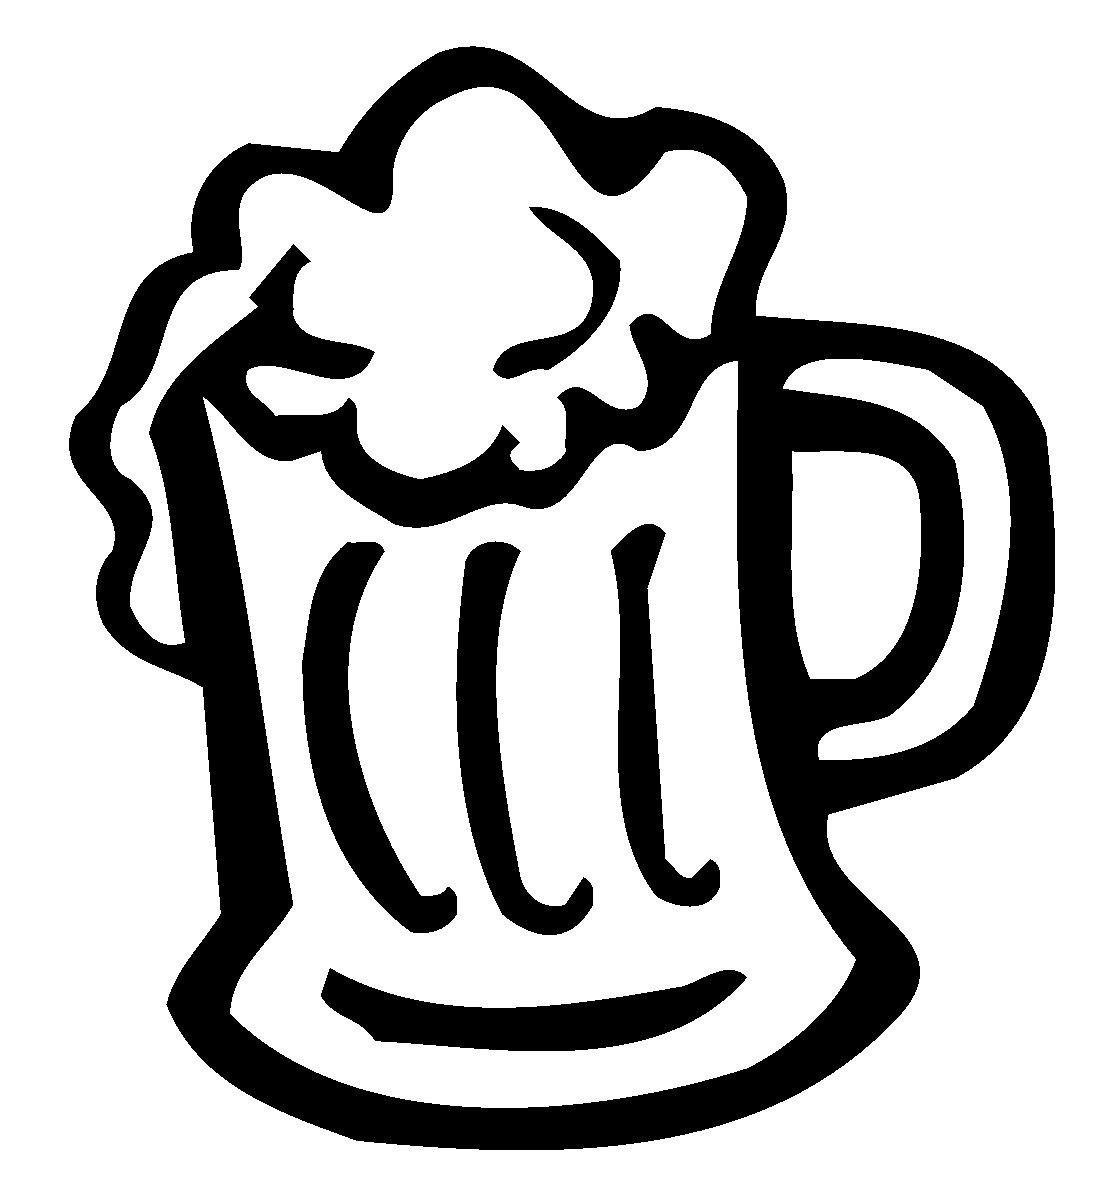 Beer Mug Clip Art Free